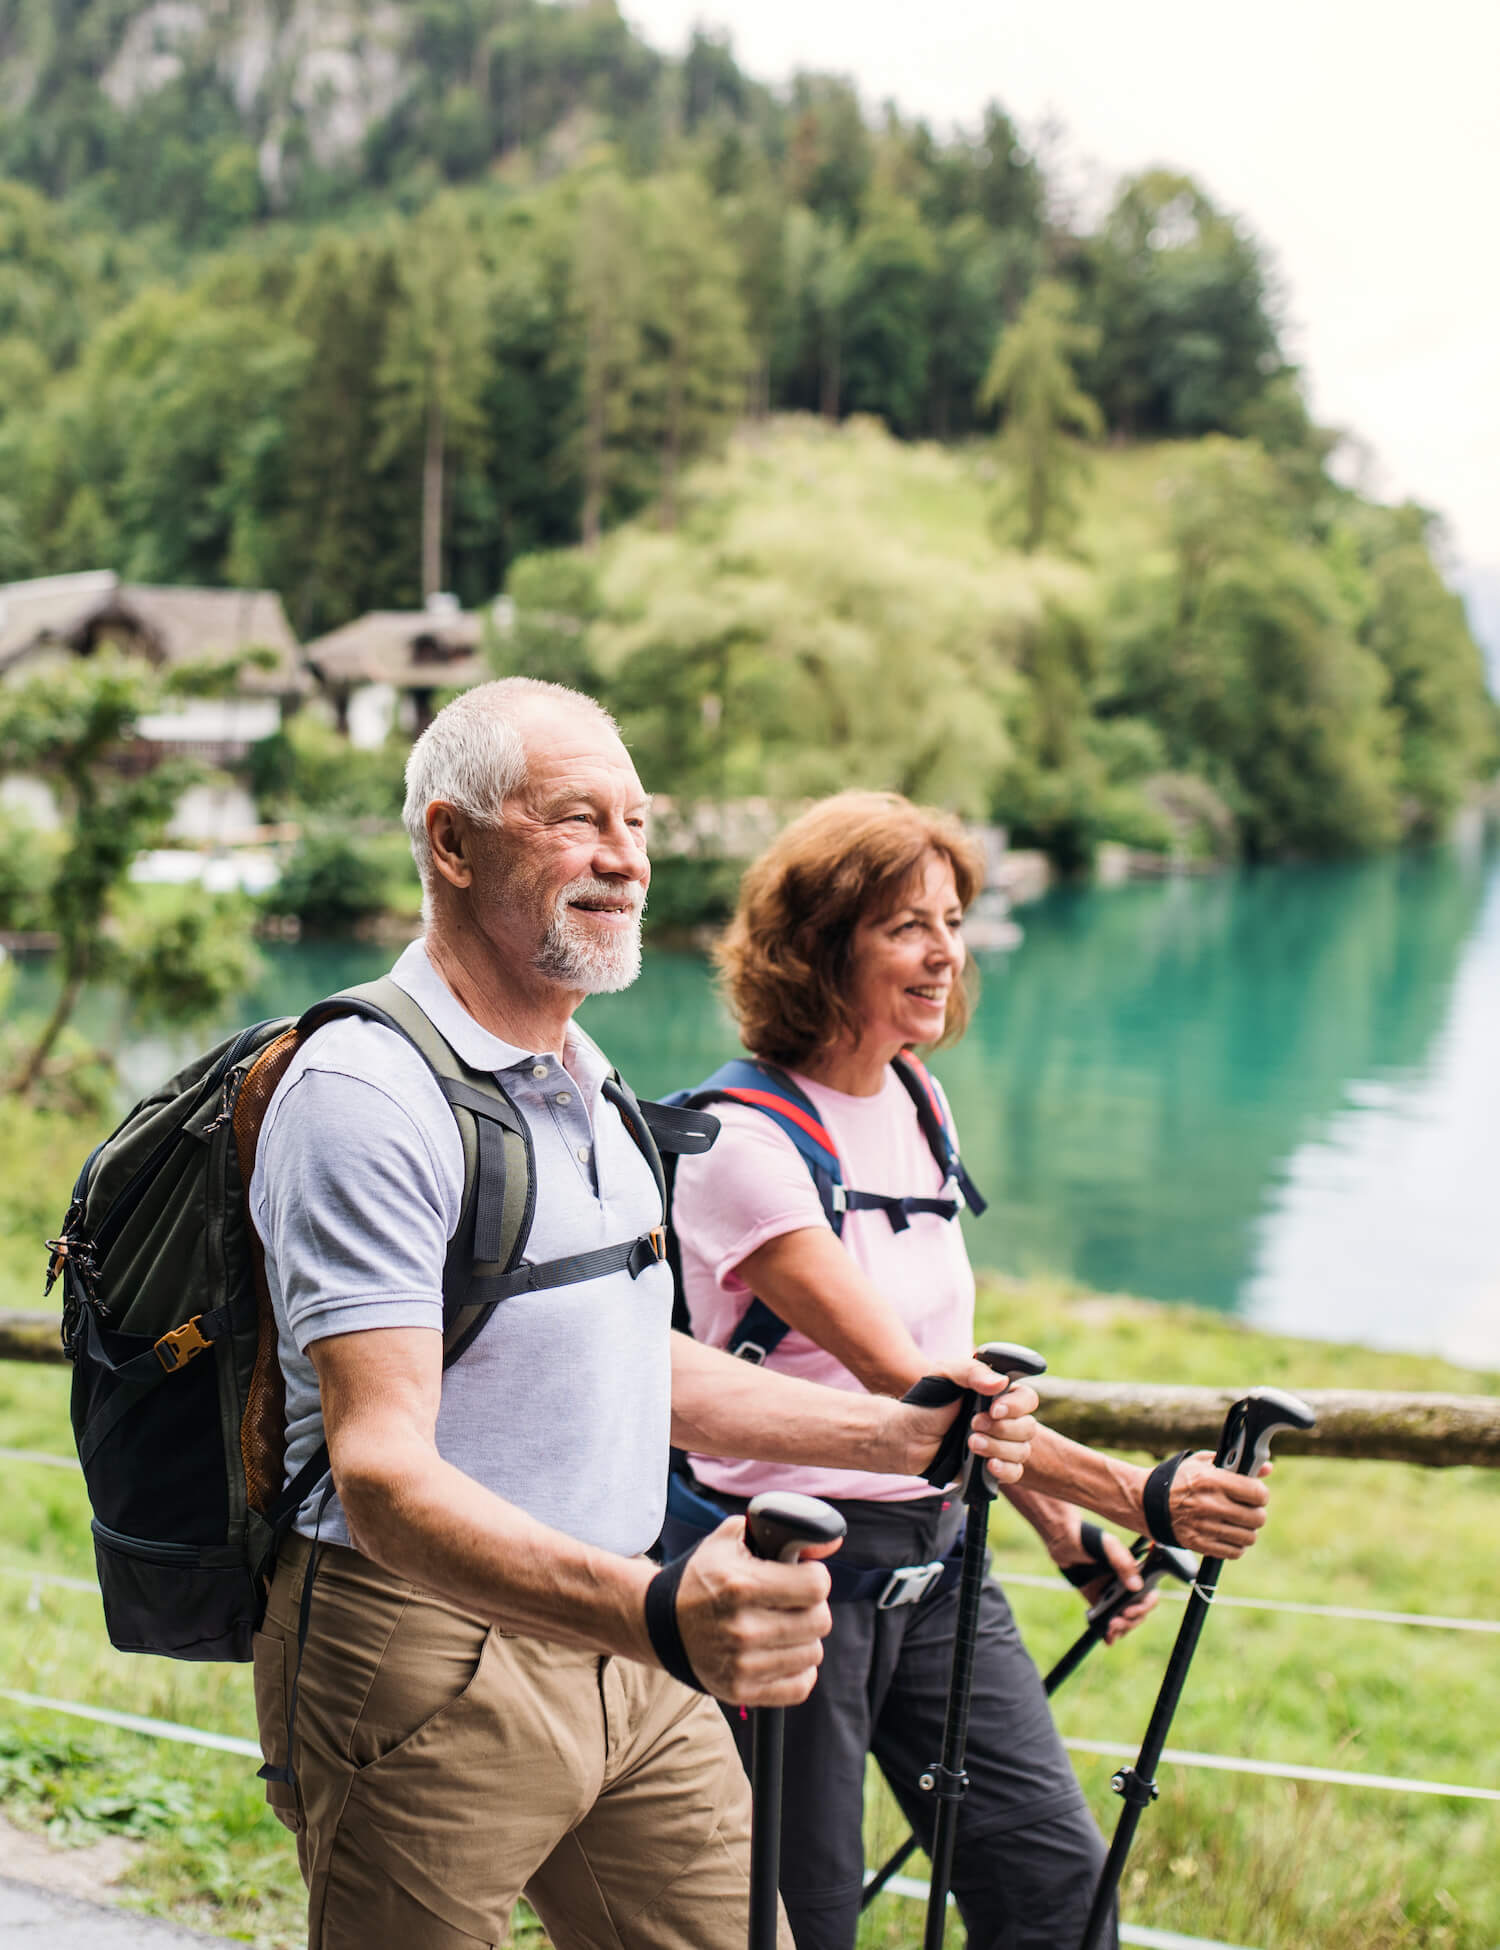 Adult couple hiking